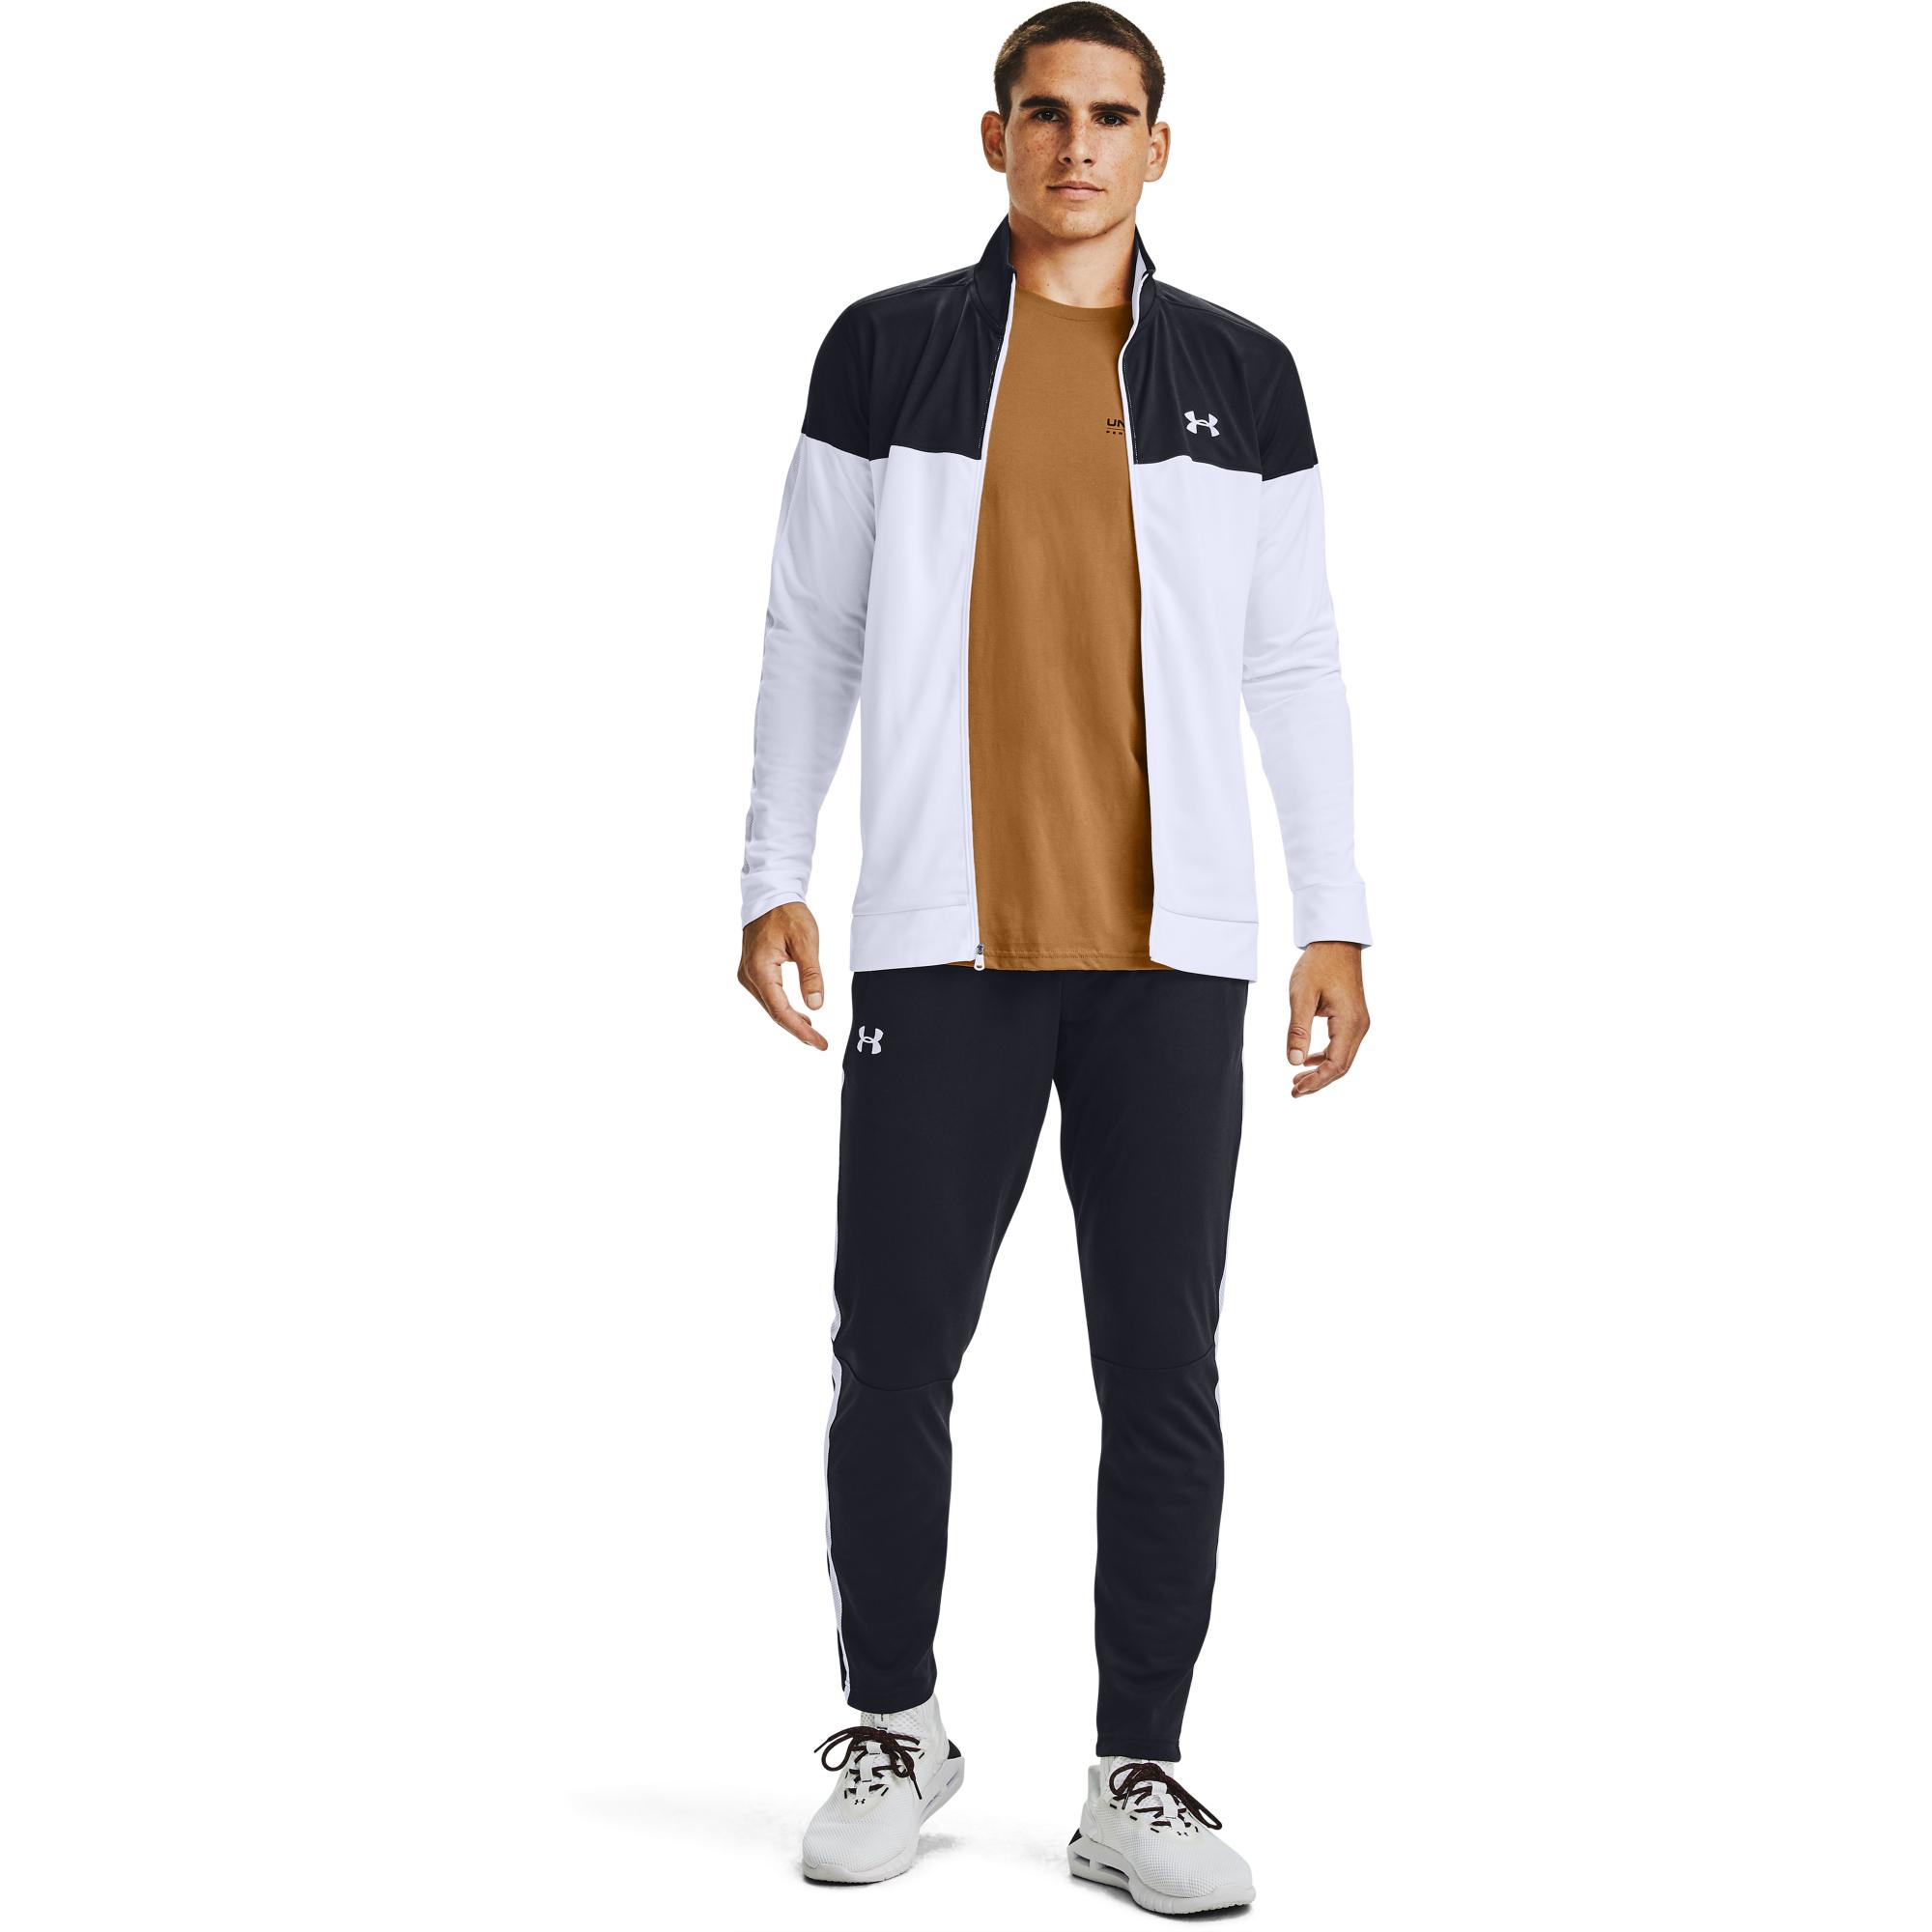 Under Armour Sportstyle Pique Trck Jacket Black/ White